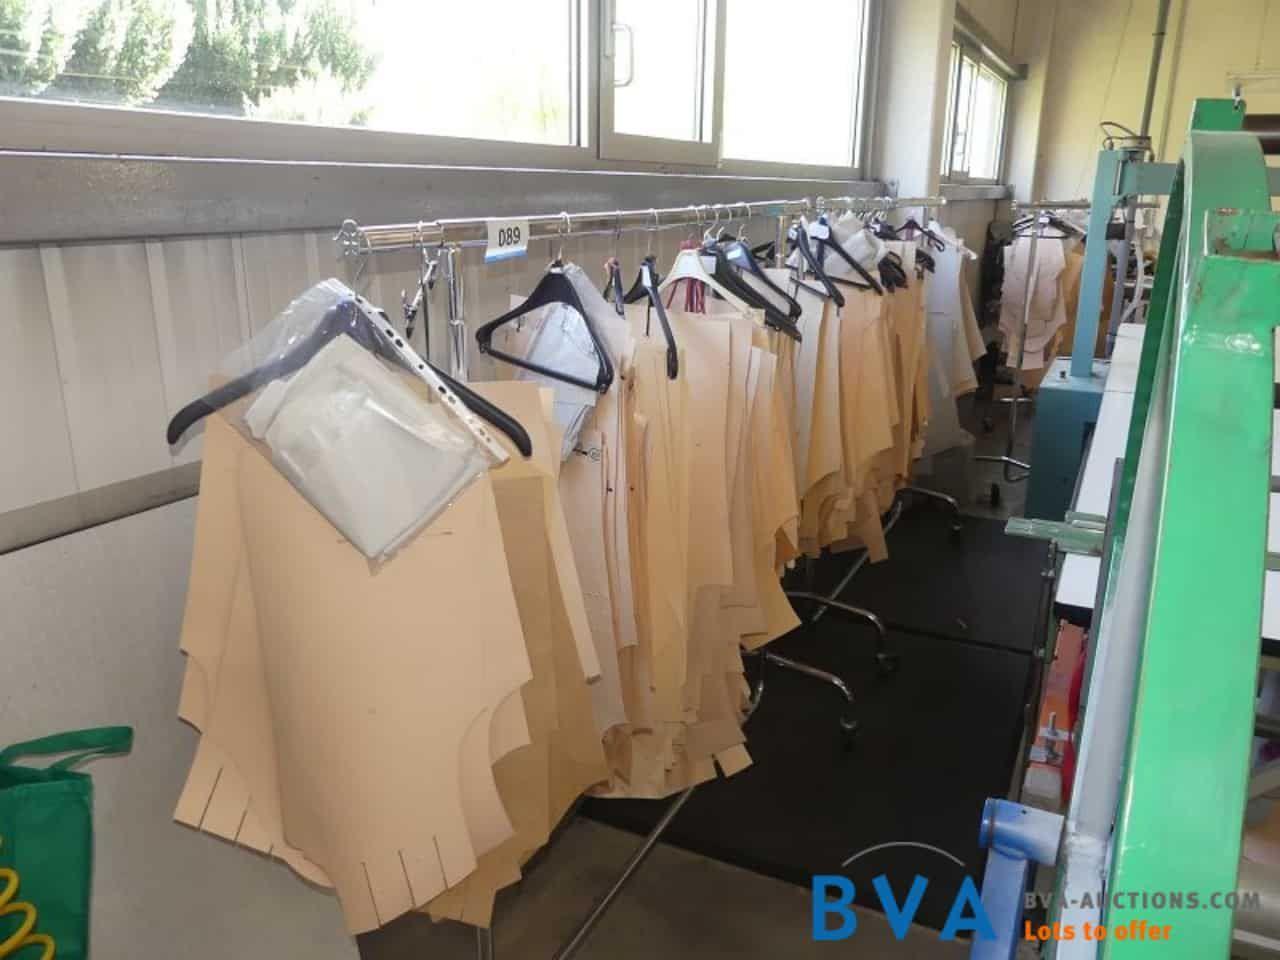 fahrbarer Kleiderbügelständer